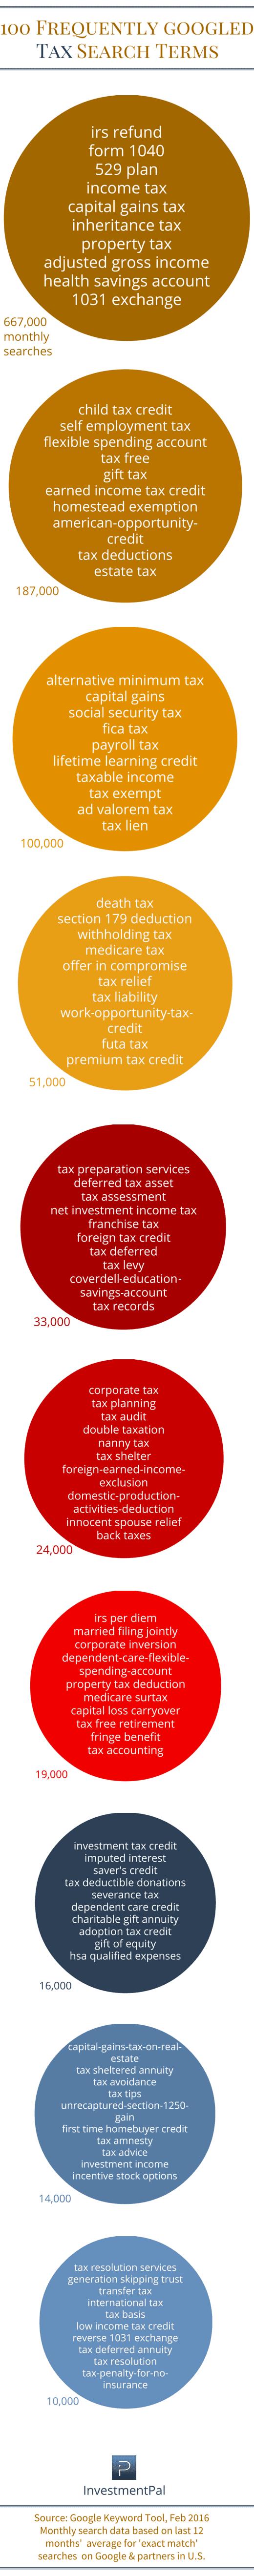 tax topics terms